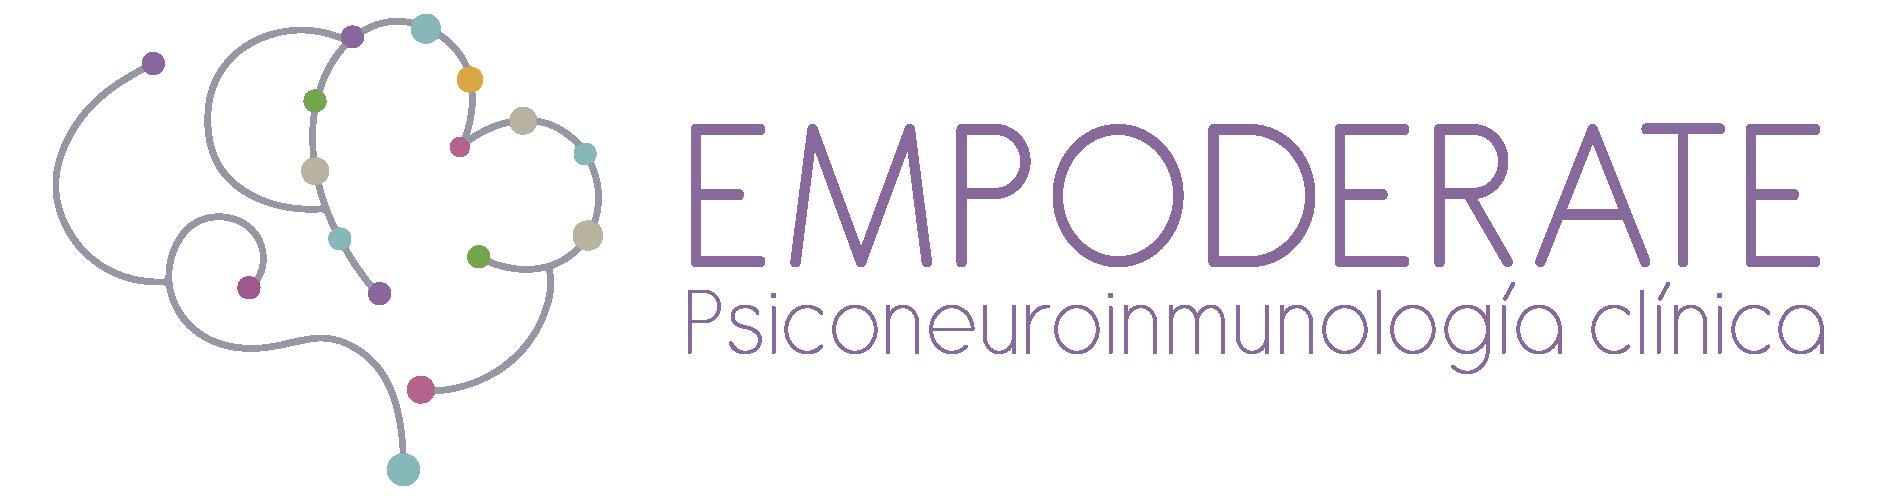 EMPONDERATE-logo